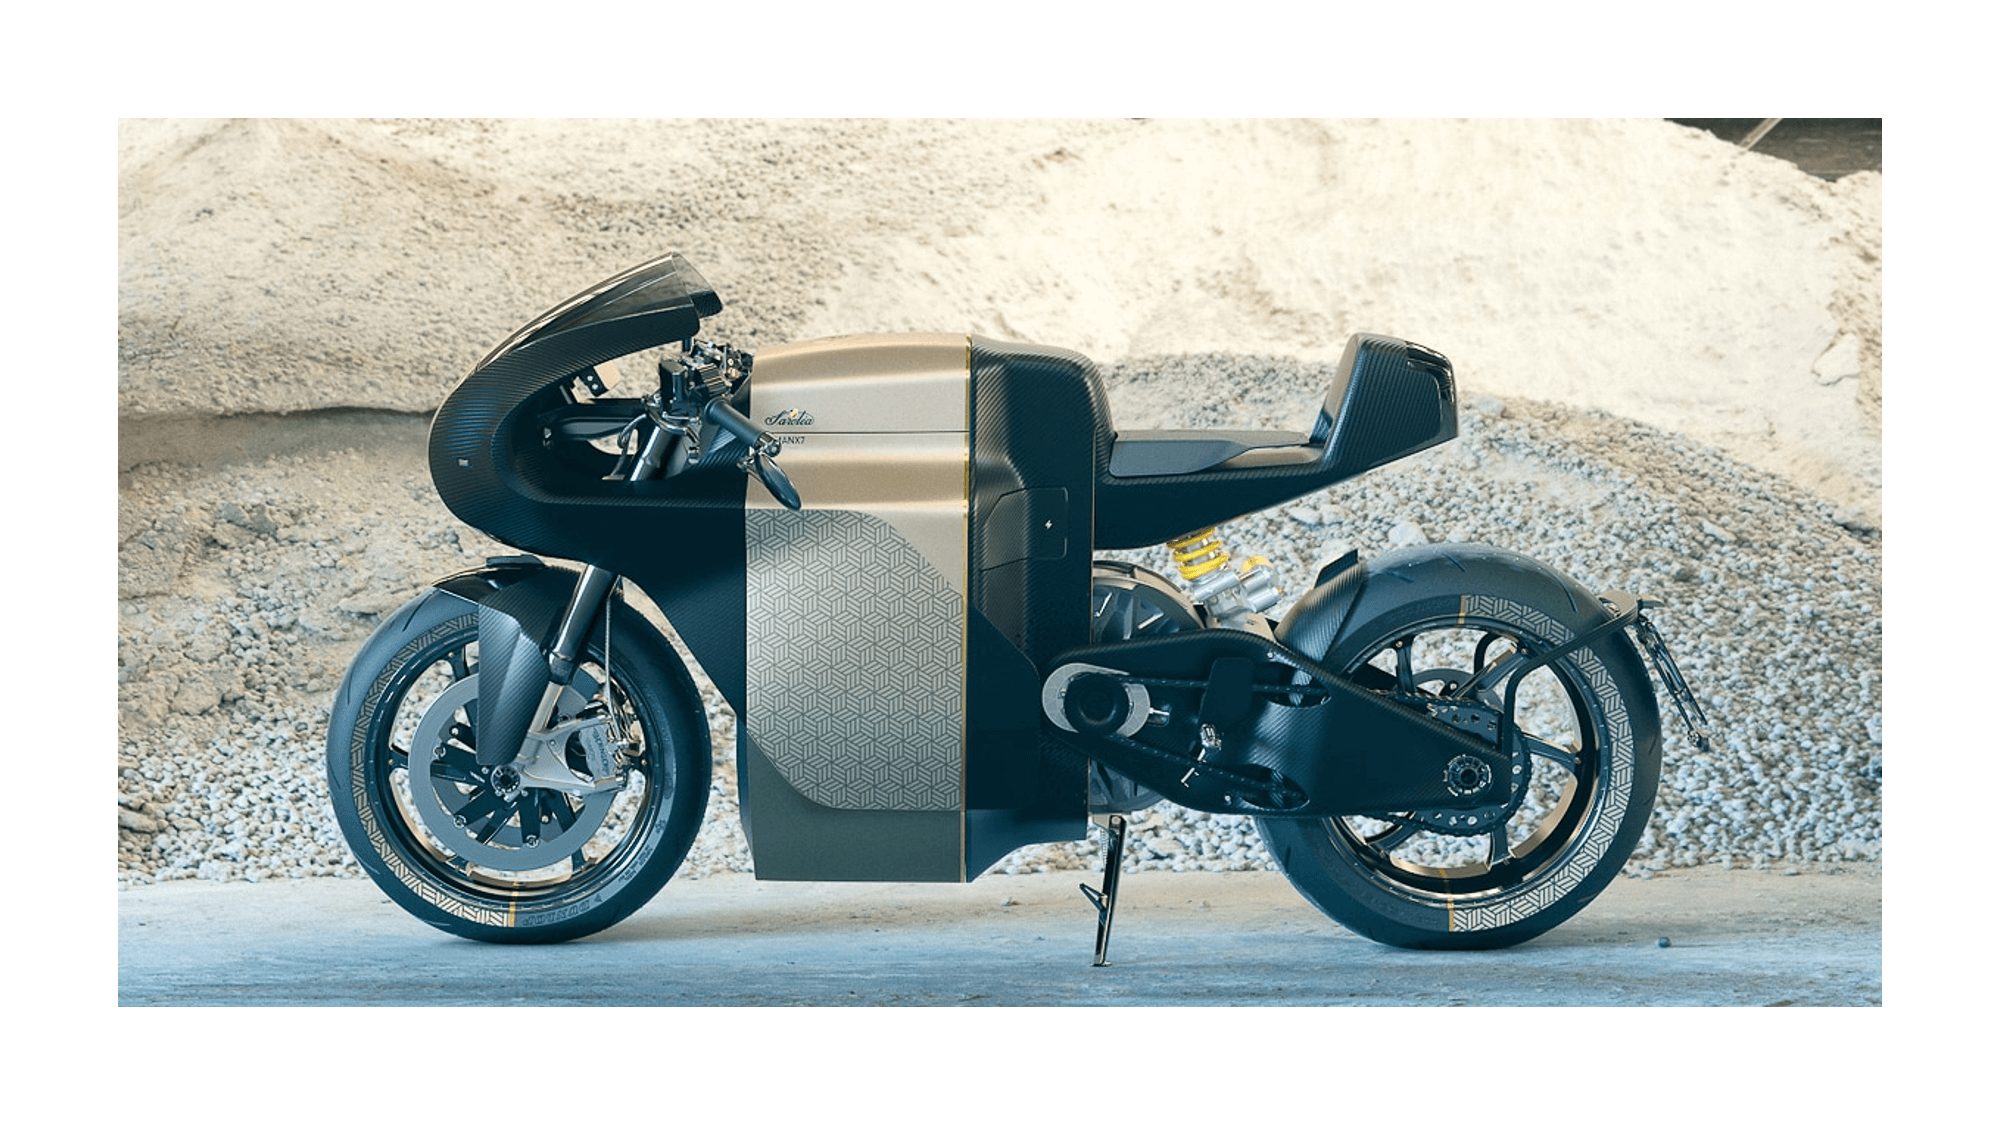 MANX7 Sarolea Motorcycles moto électrique puissante